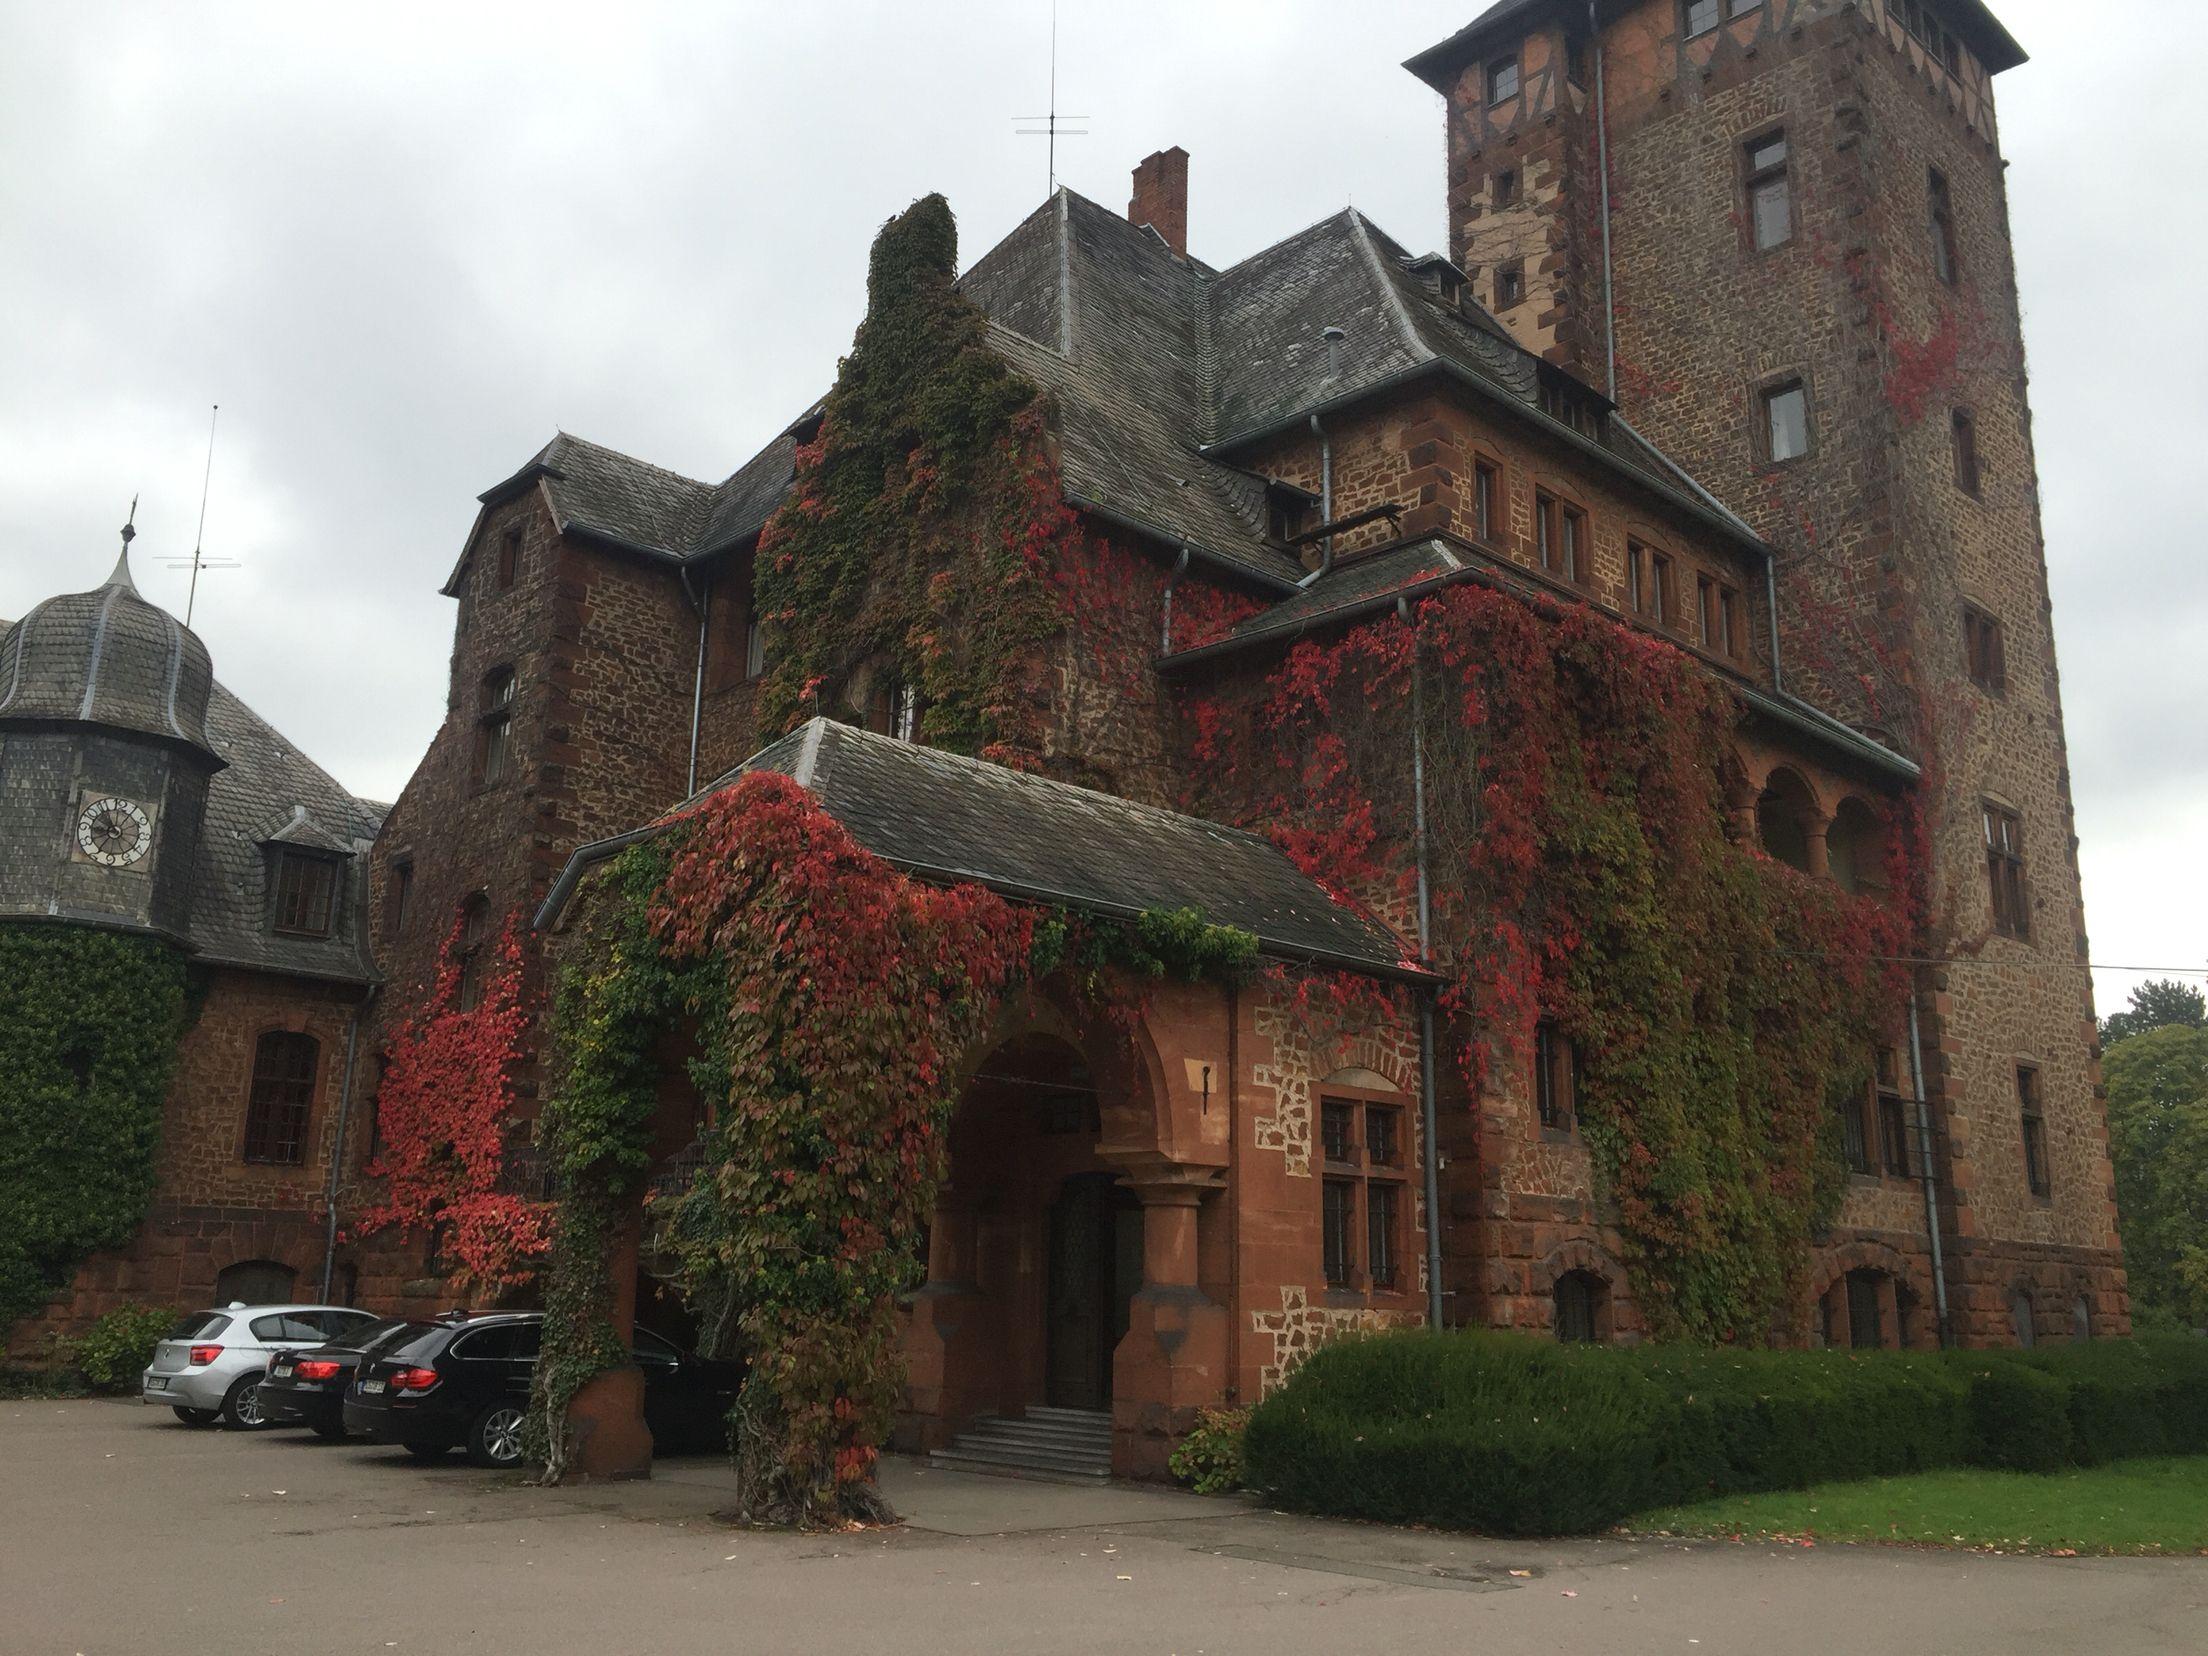 Villeroy Und Boch Mettlach castle of v b in mettlach germany villeroy boch